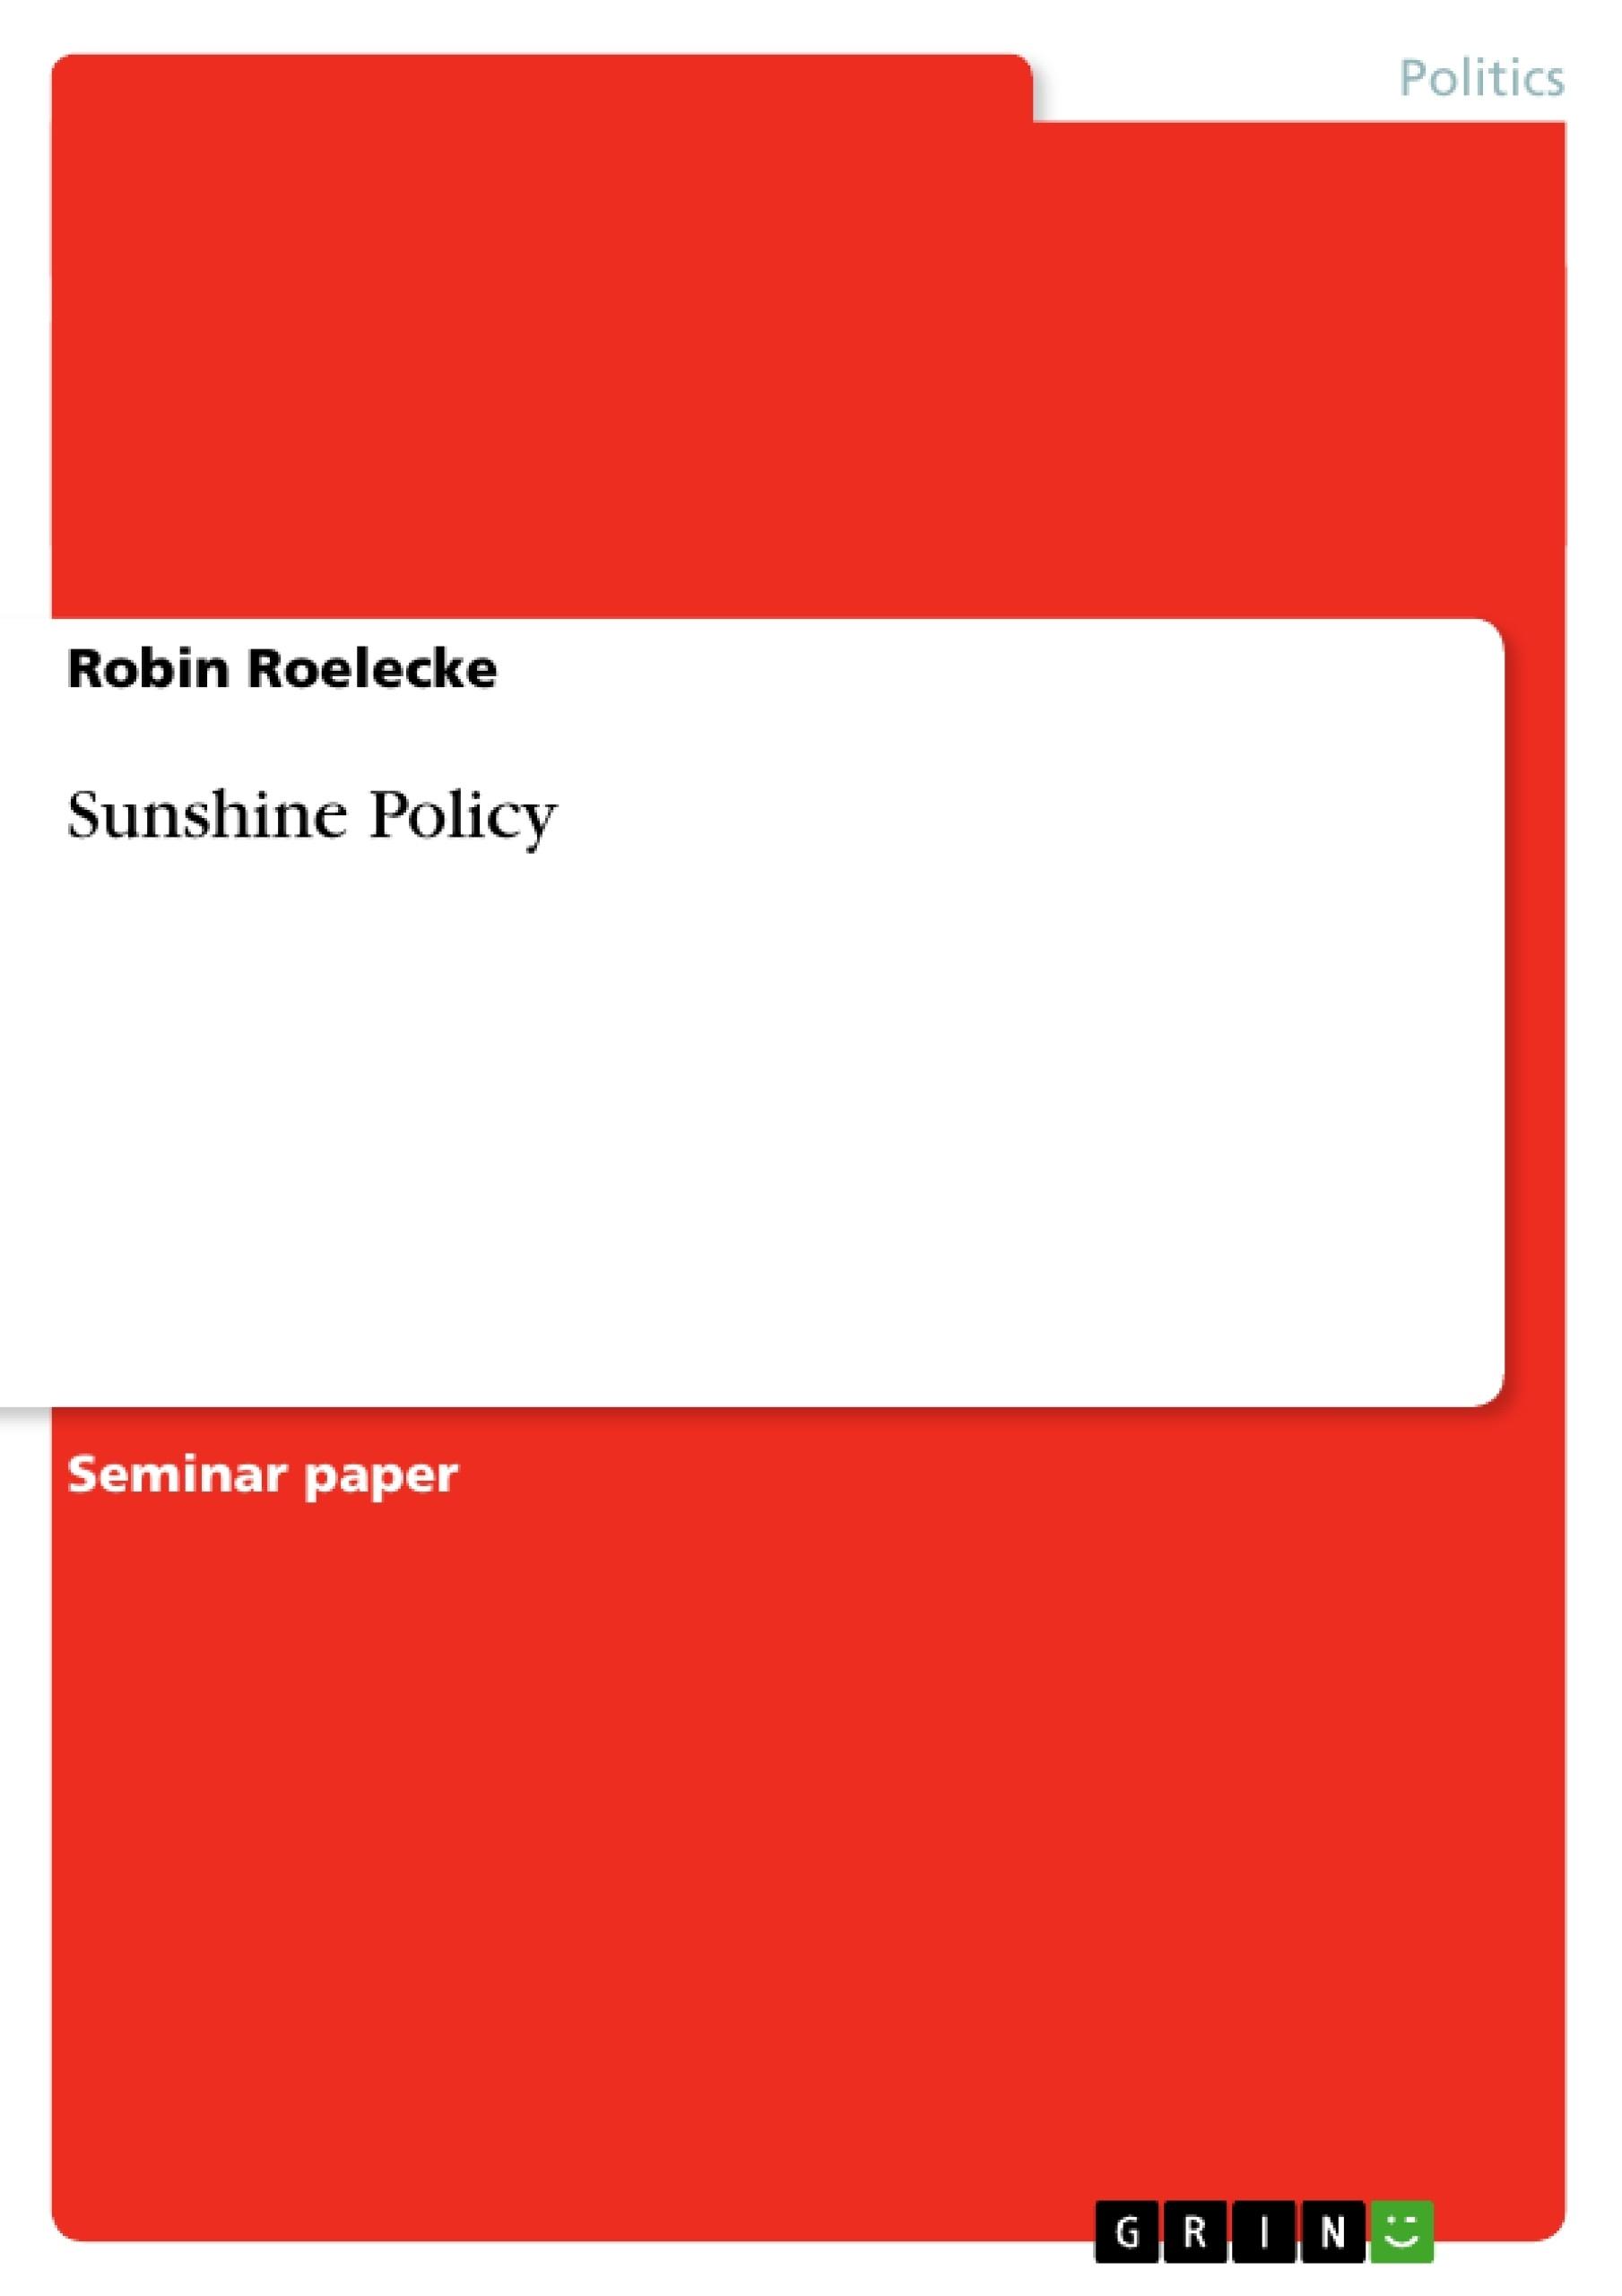 Title: Sunshine Policy